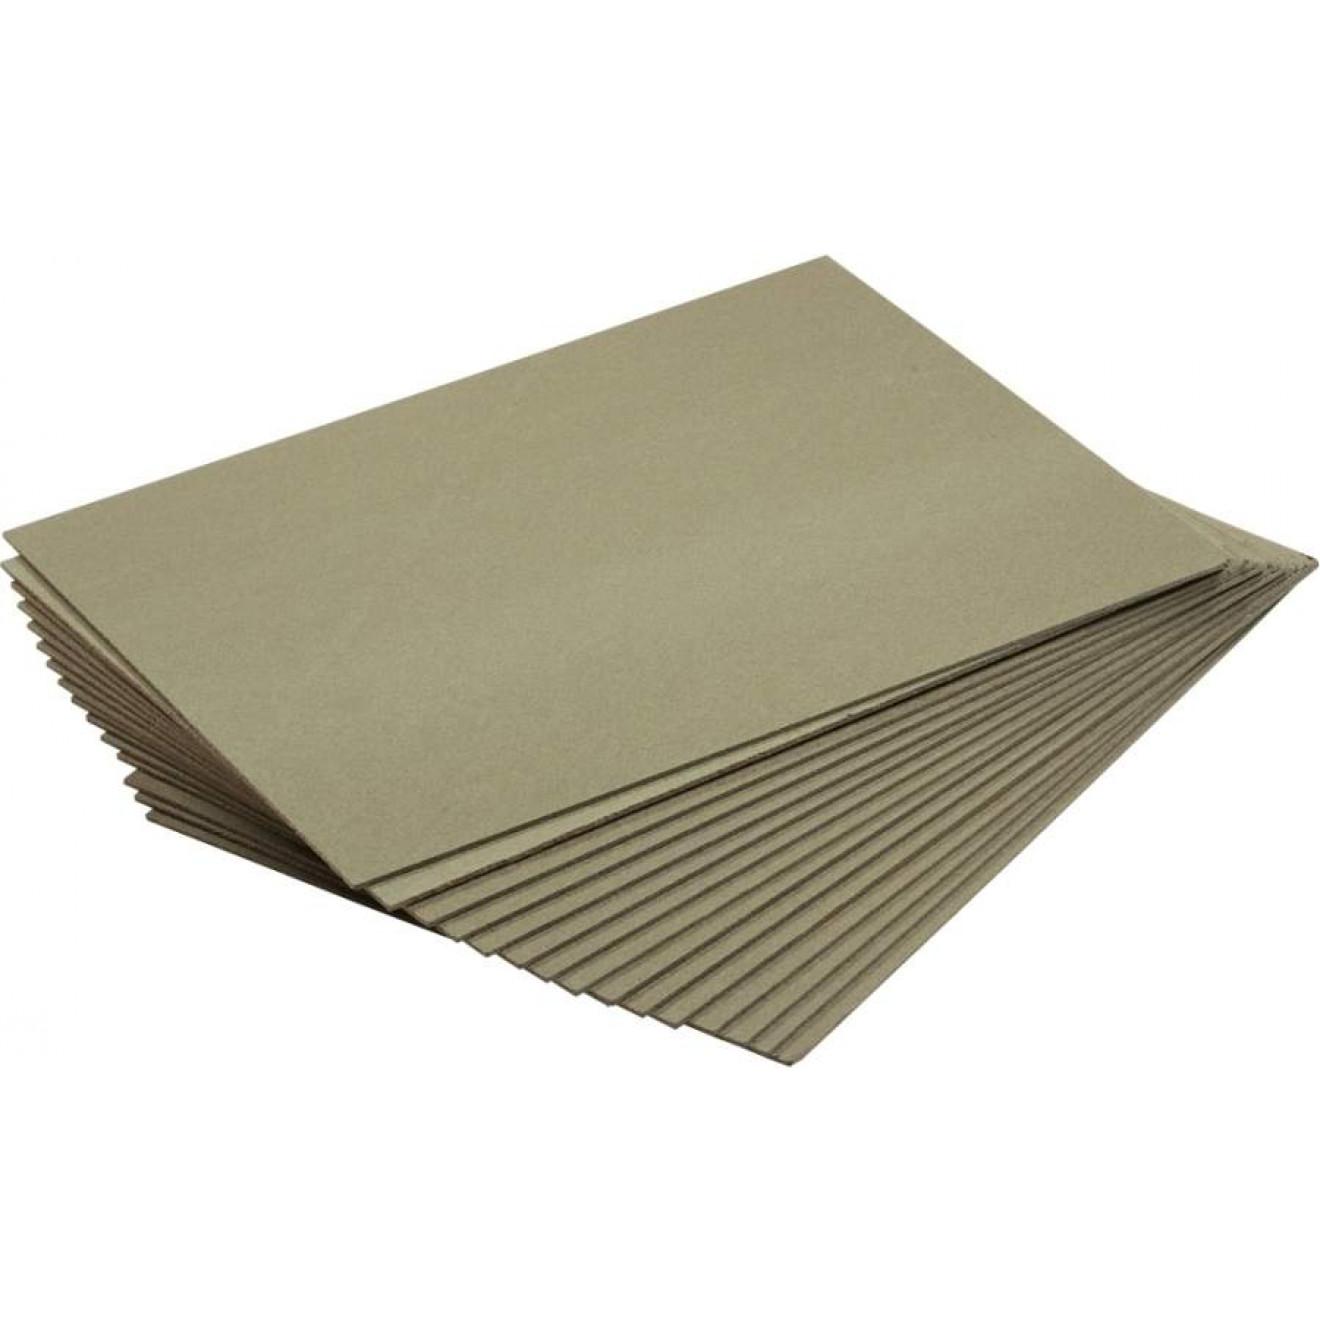 10 3qm parkett felt 22 platten je 79cm x 59cm st rke 4 0mm. Black Bedroom Furniture Sets. Home Design Ideas